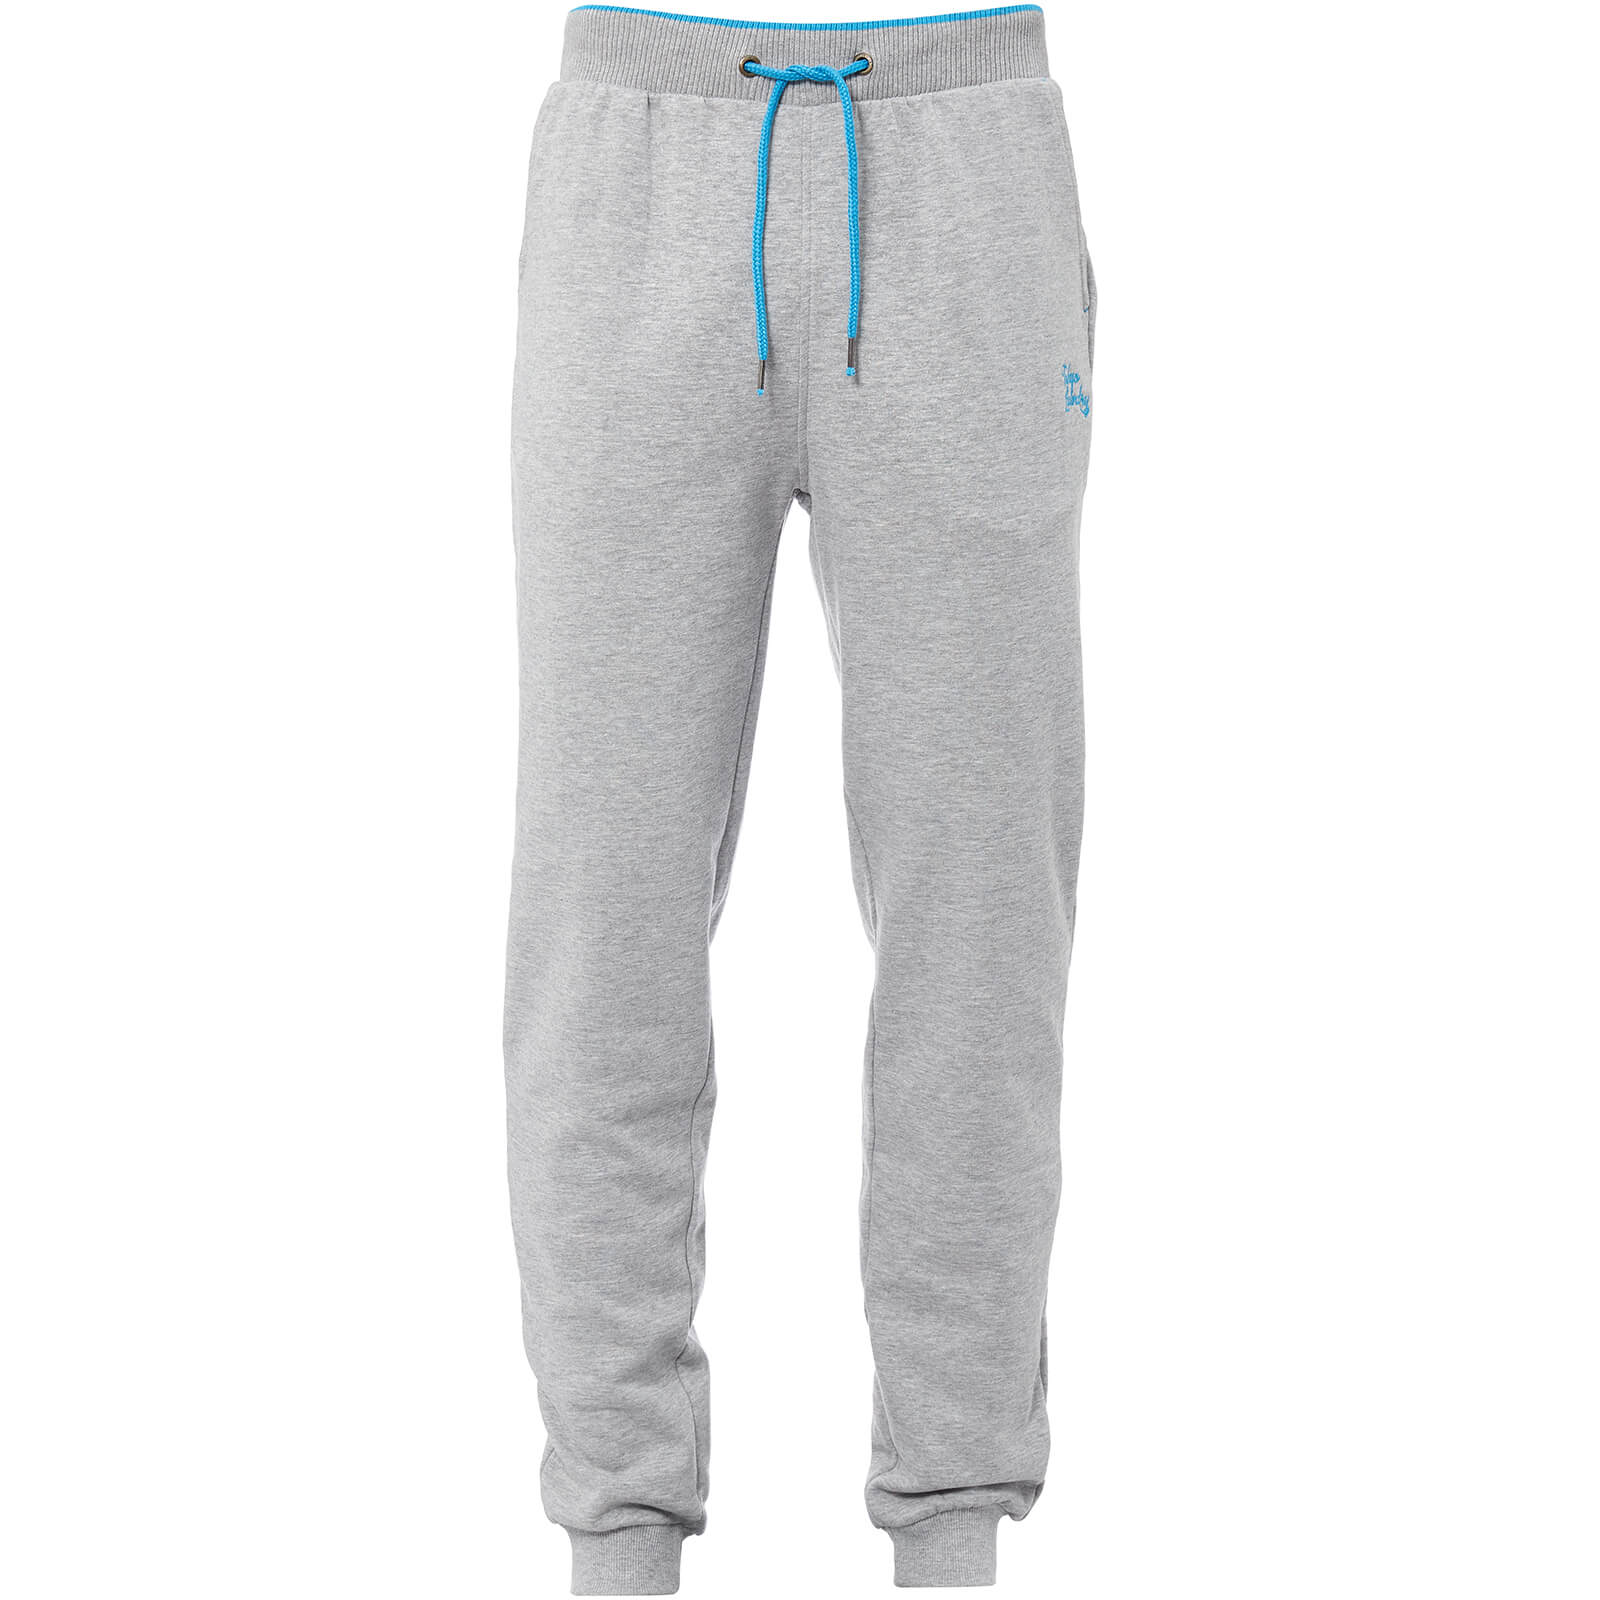 dd89ad652 Tokyo Laundry Men s Western Sweatpants - Light Grey Marl Clothing ...